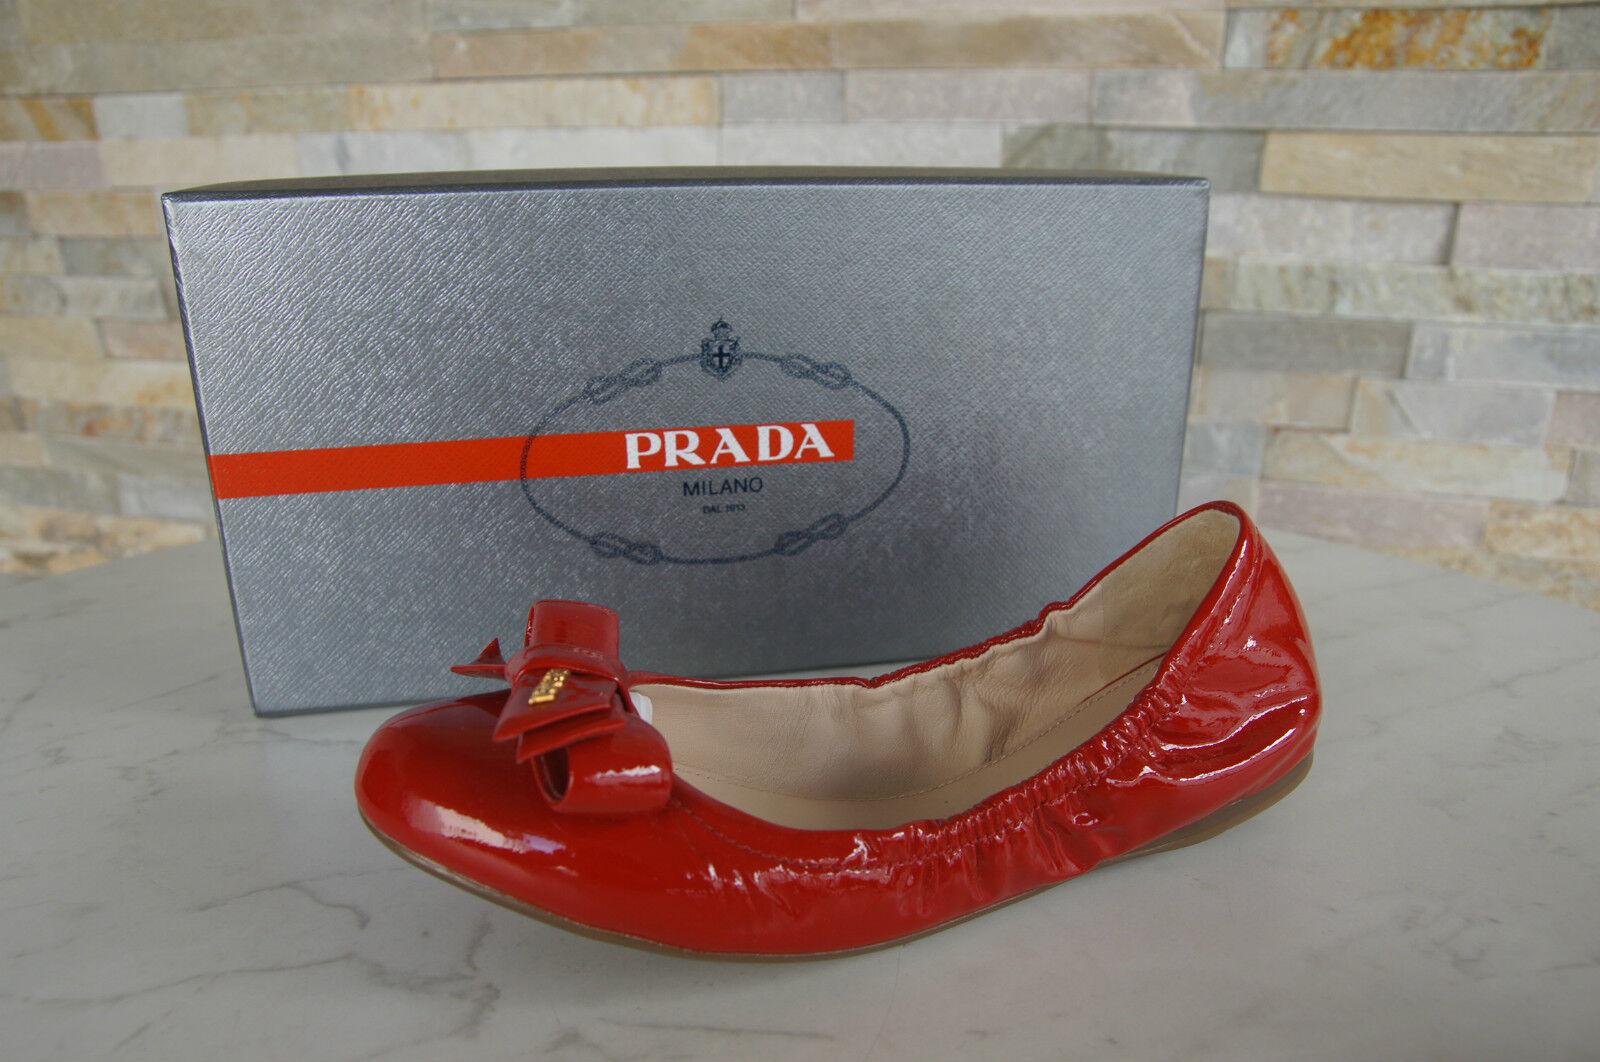 Prada Gr 37 Bailarinas Zapatilla bajo Zapatos Cordero Charol Rojo Rojo Rojo Nuevo Antiguo  mas barato